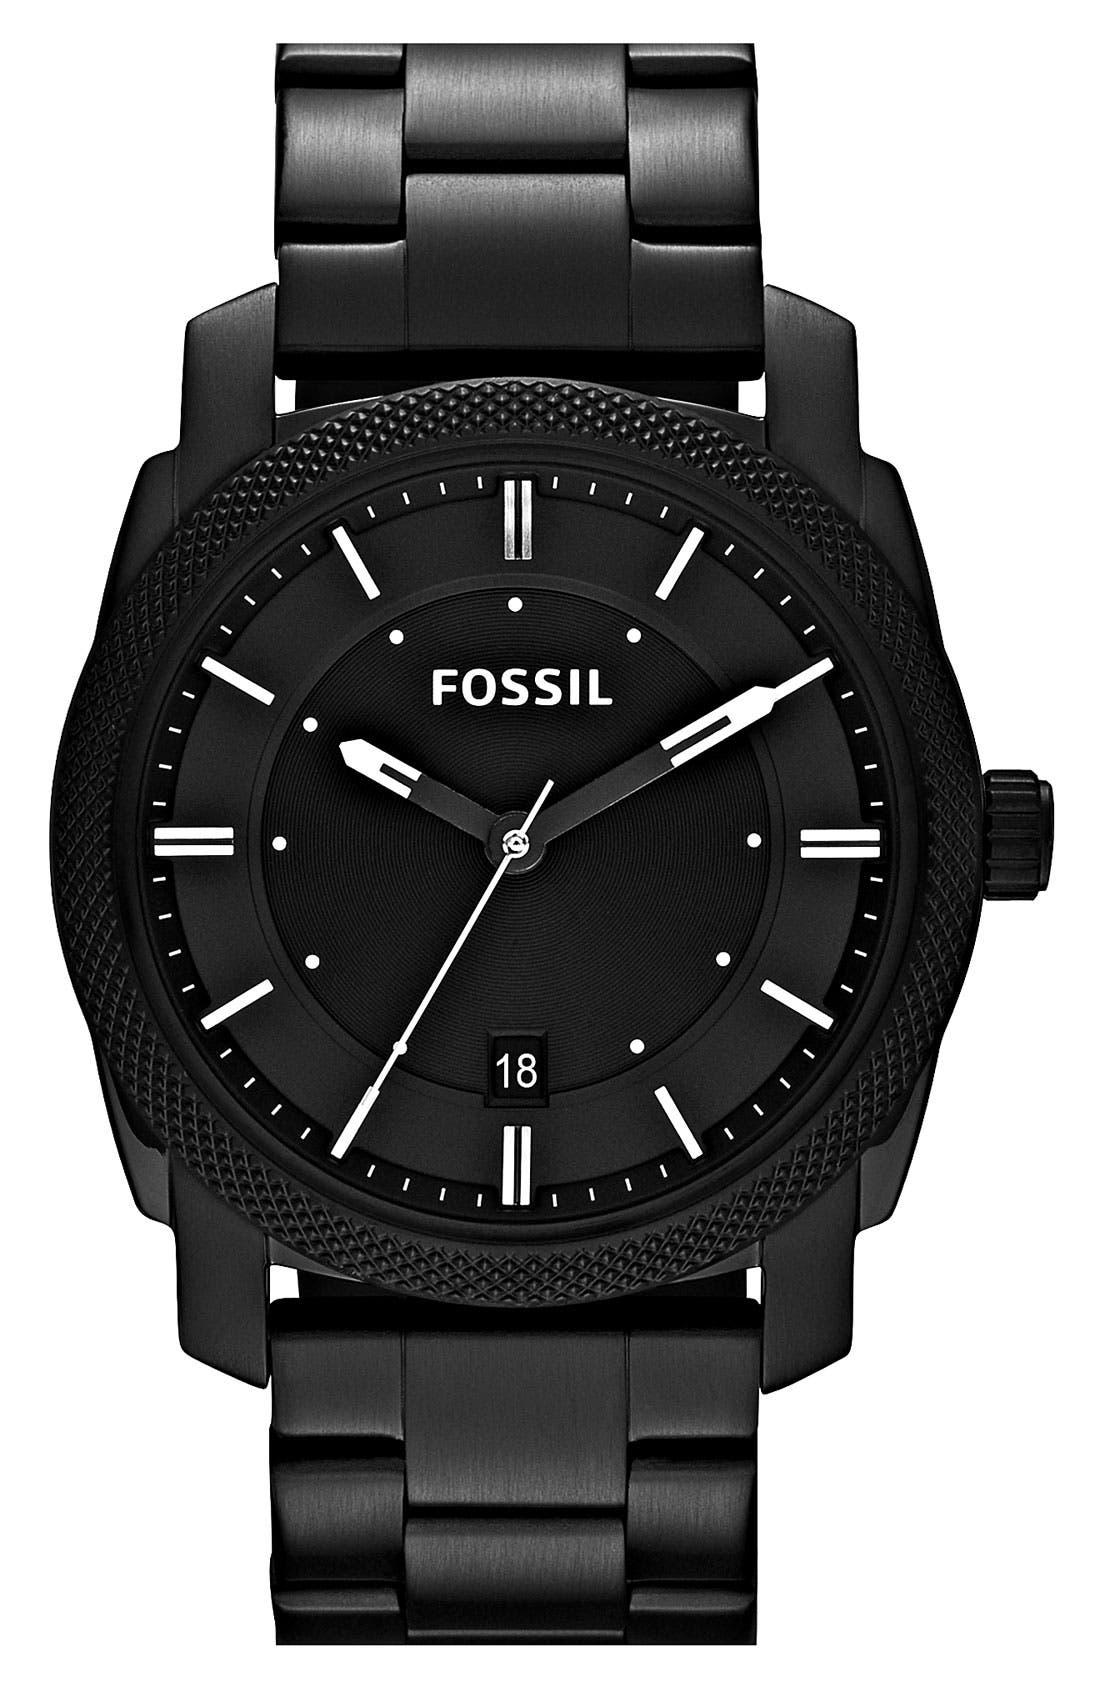 FOSSIL 'Machine' Bracelet Watch, 42mm, Main, color, BLACK